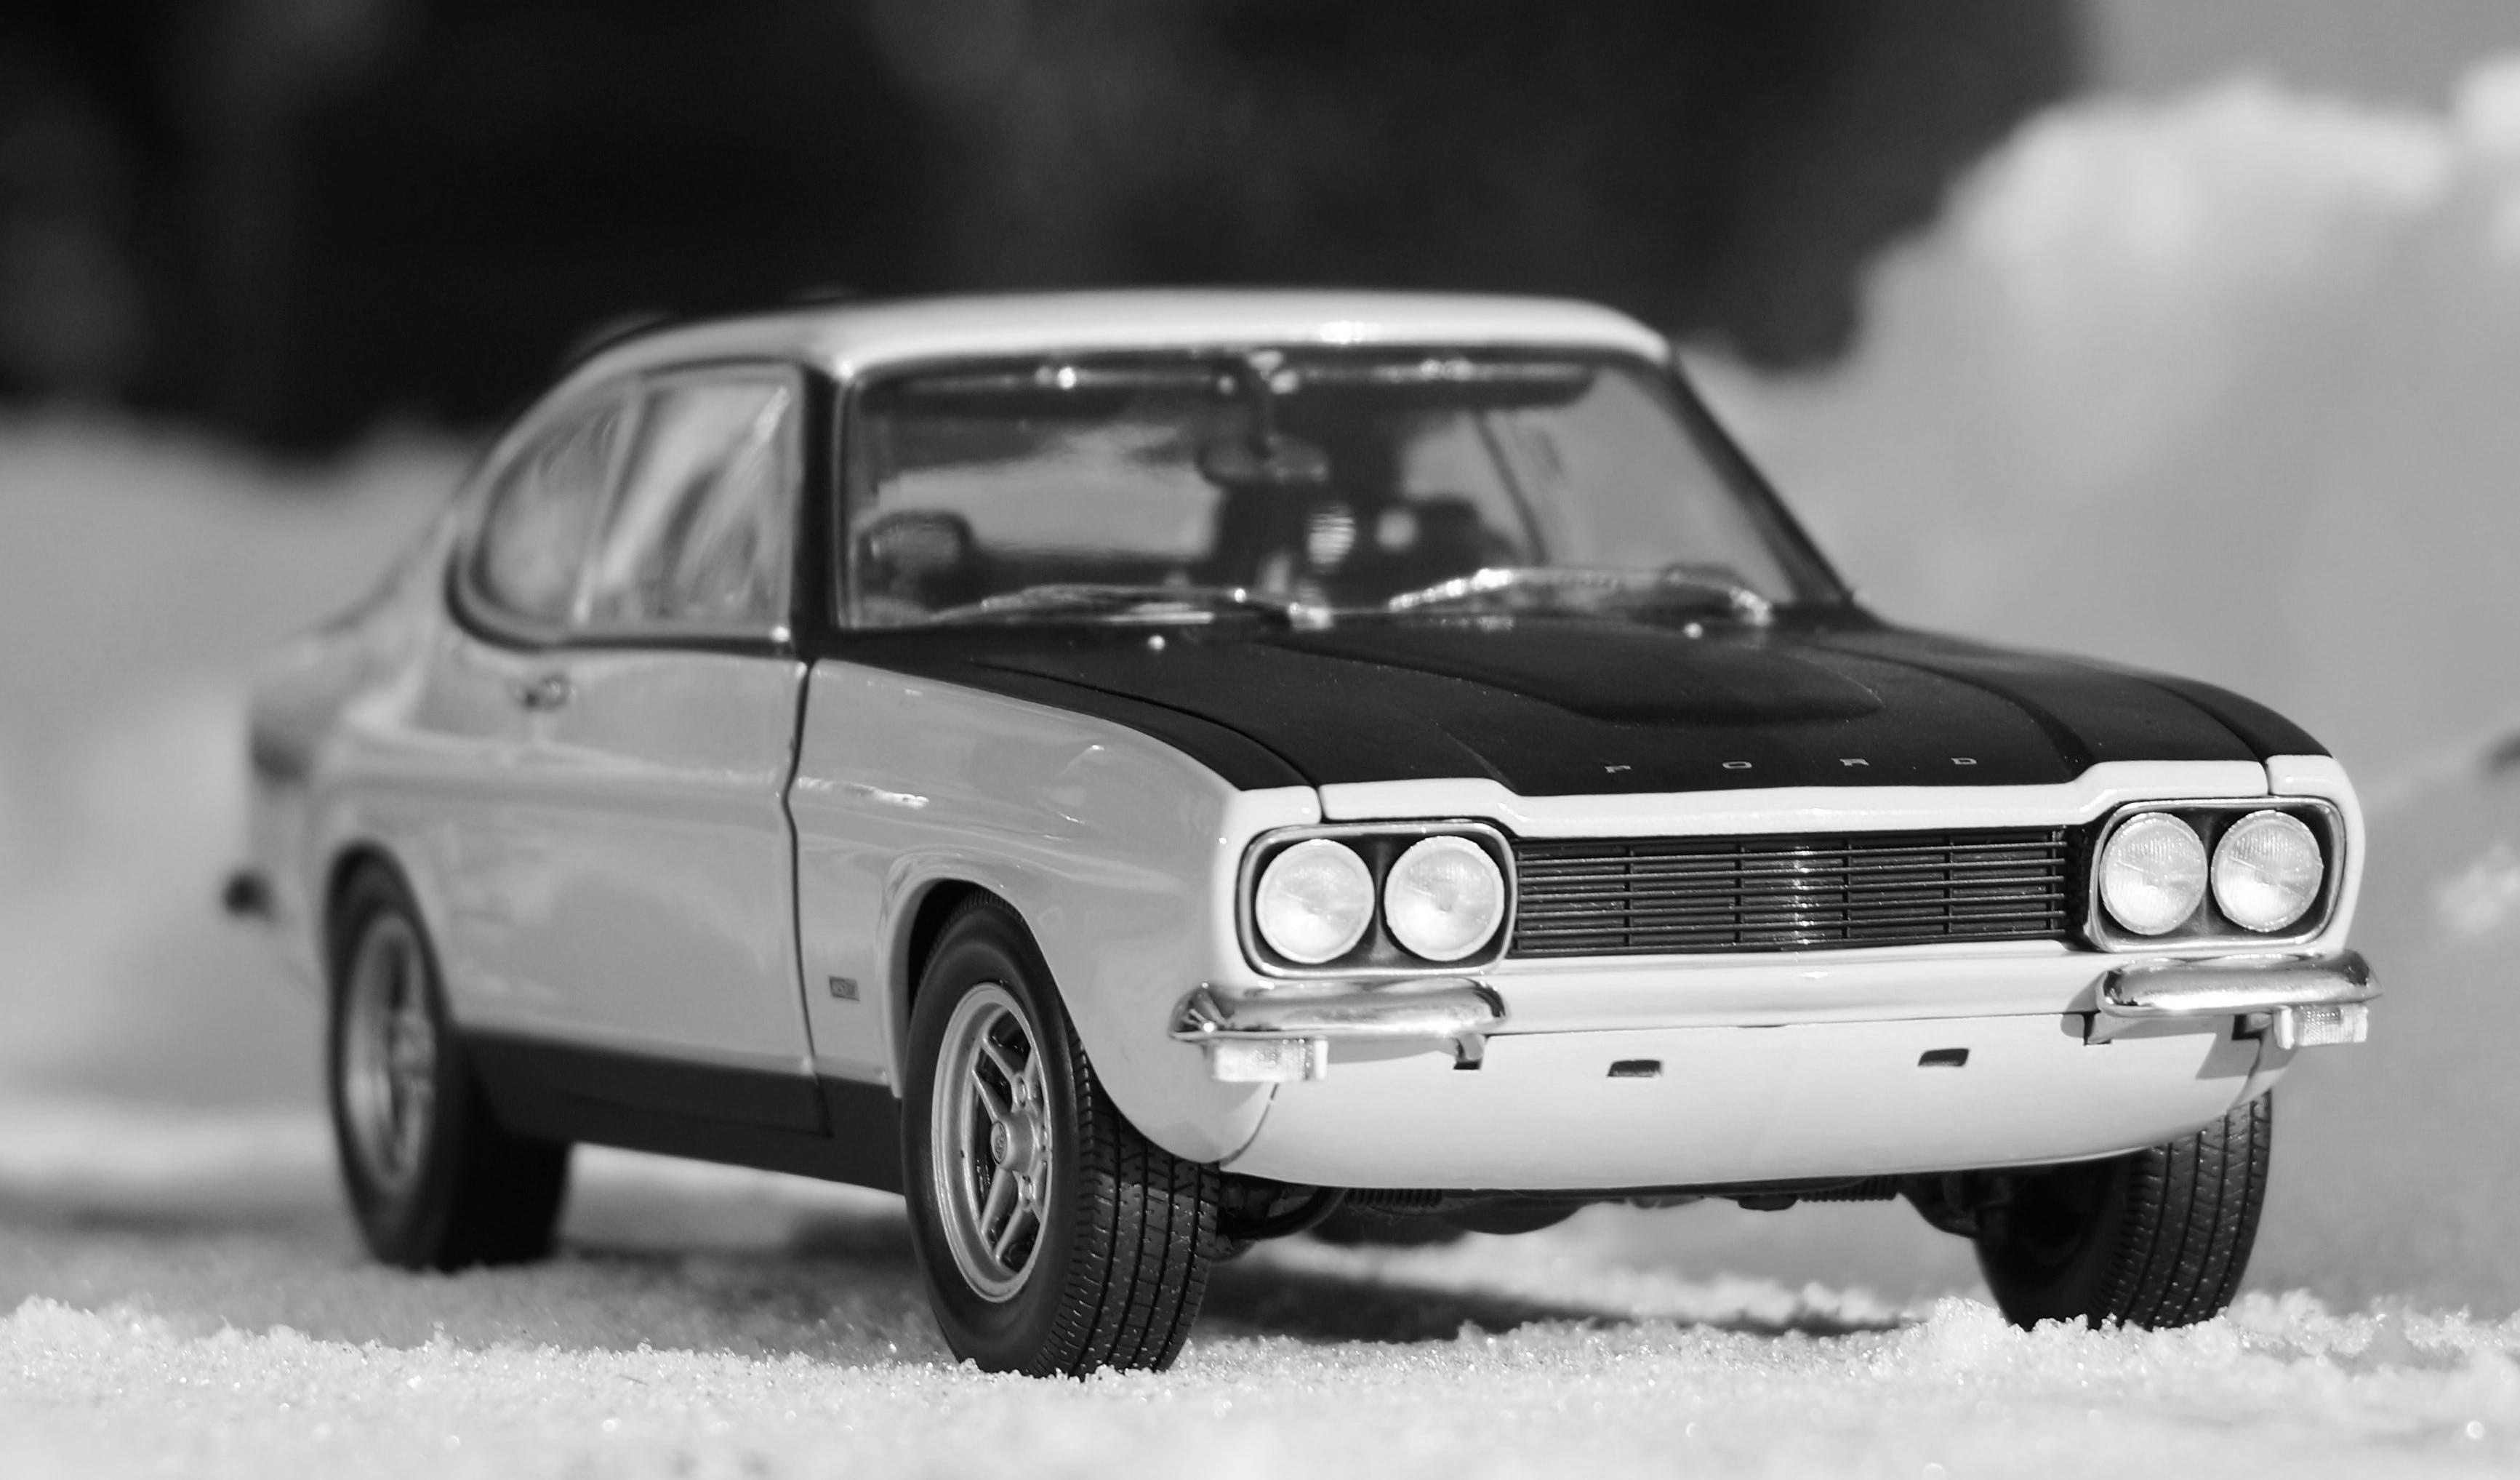 Free stock photo of snow, vehicles, model, oldtimer